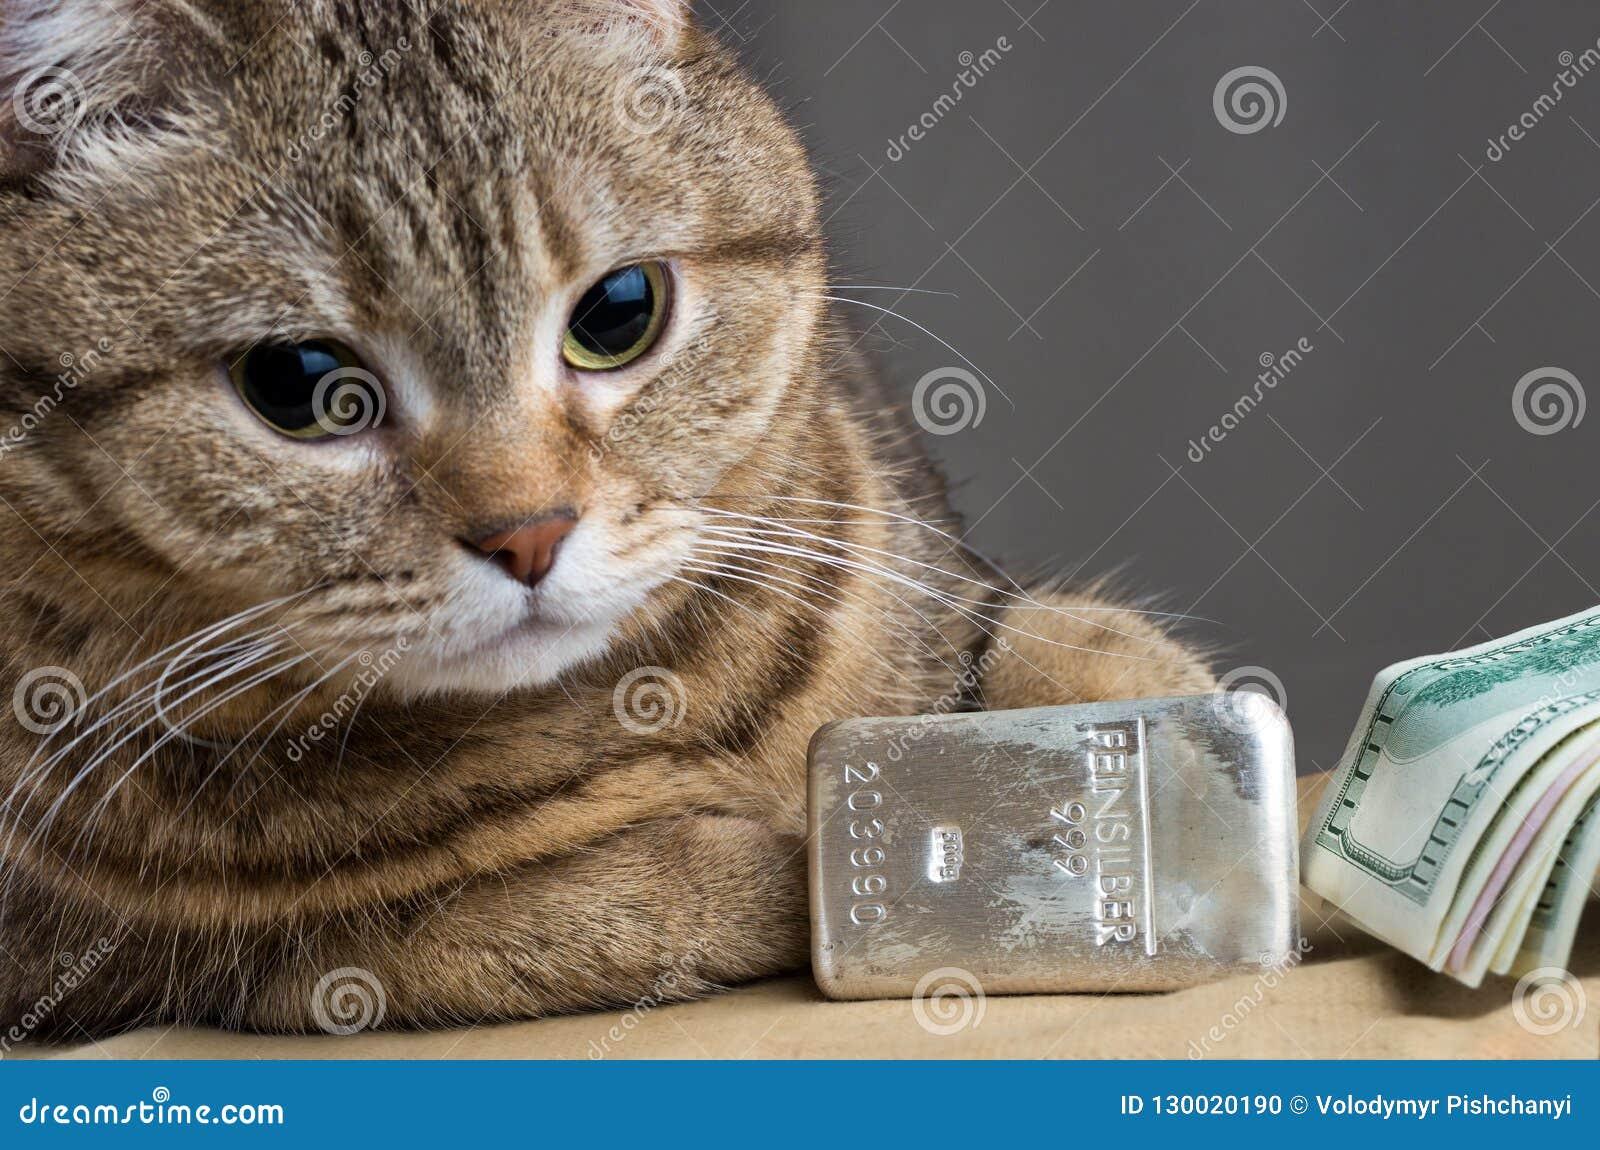 A rich cat. Cat`s head near the silver bullion and cash dollars